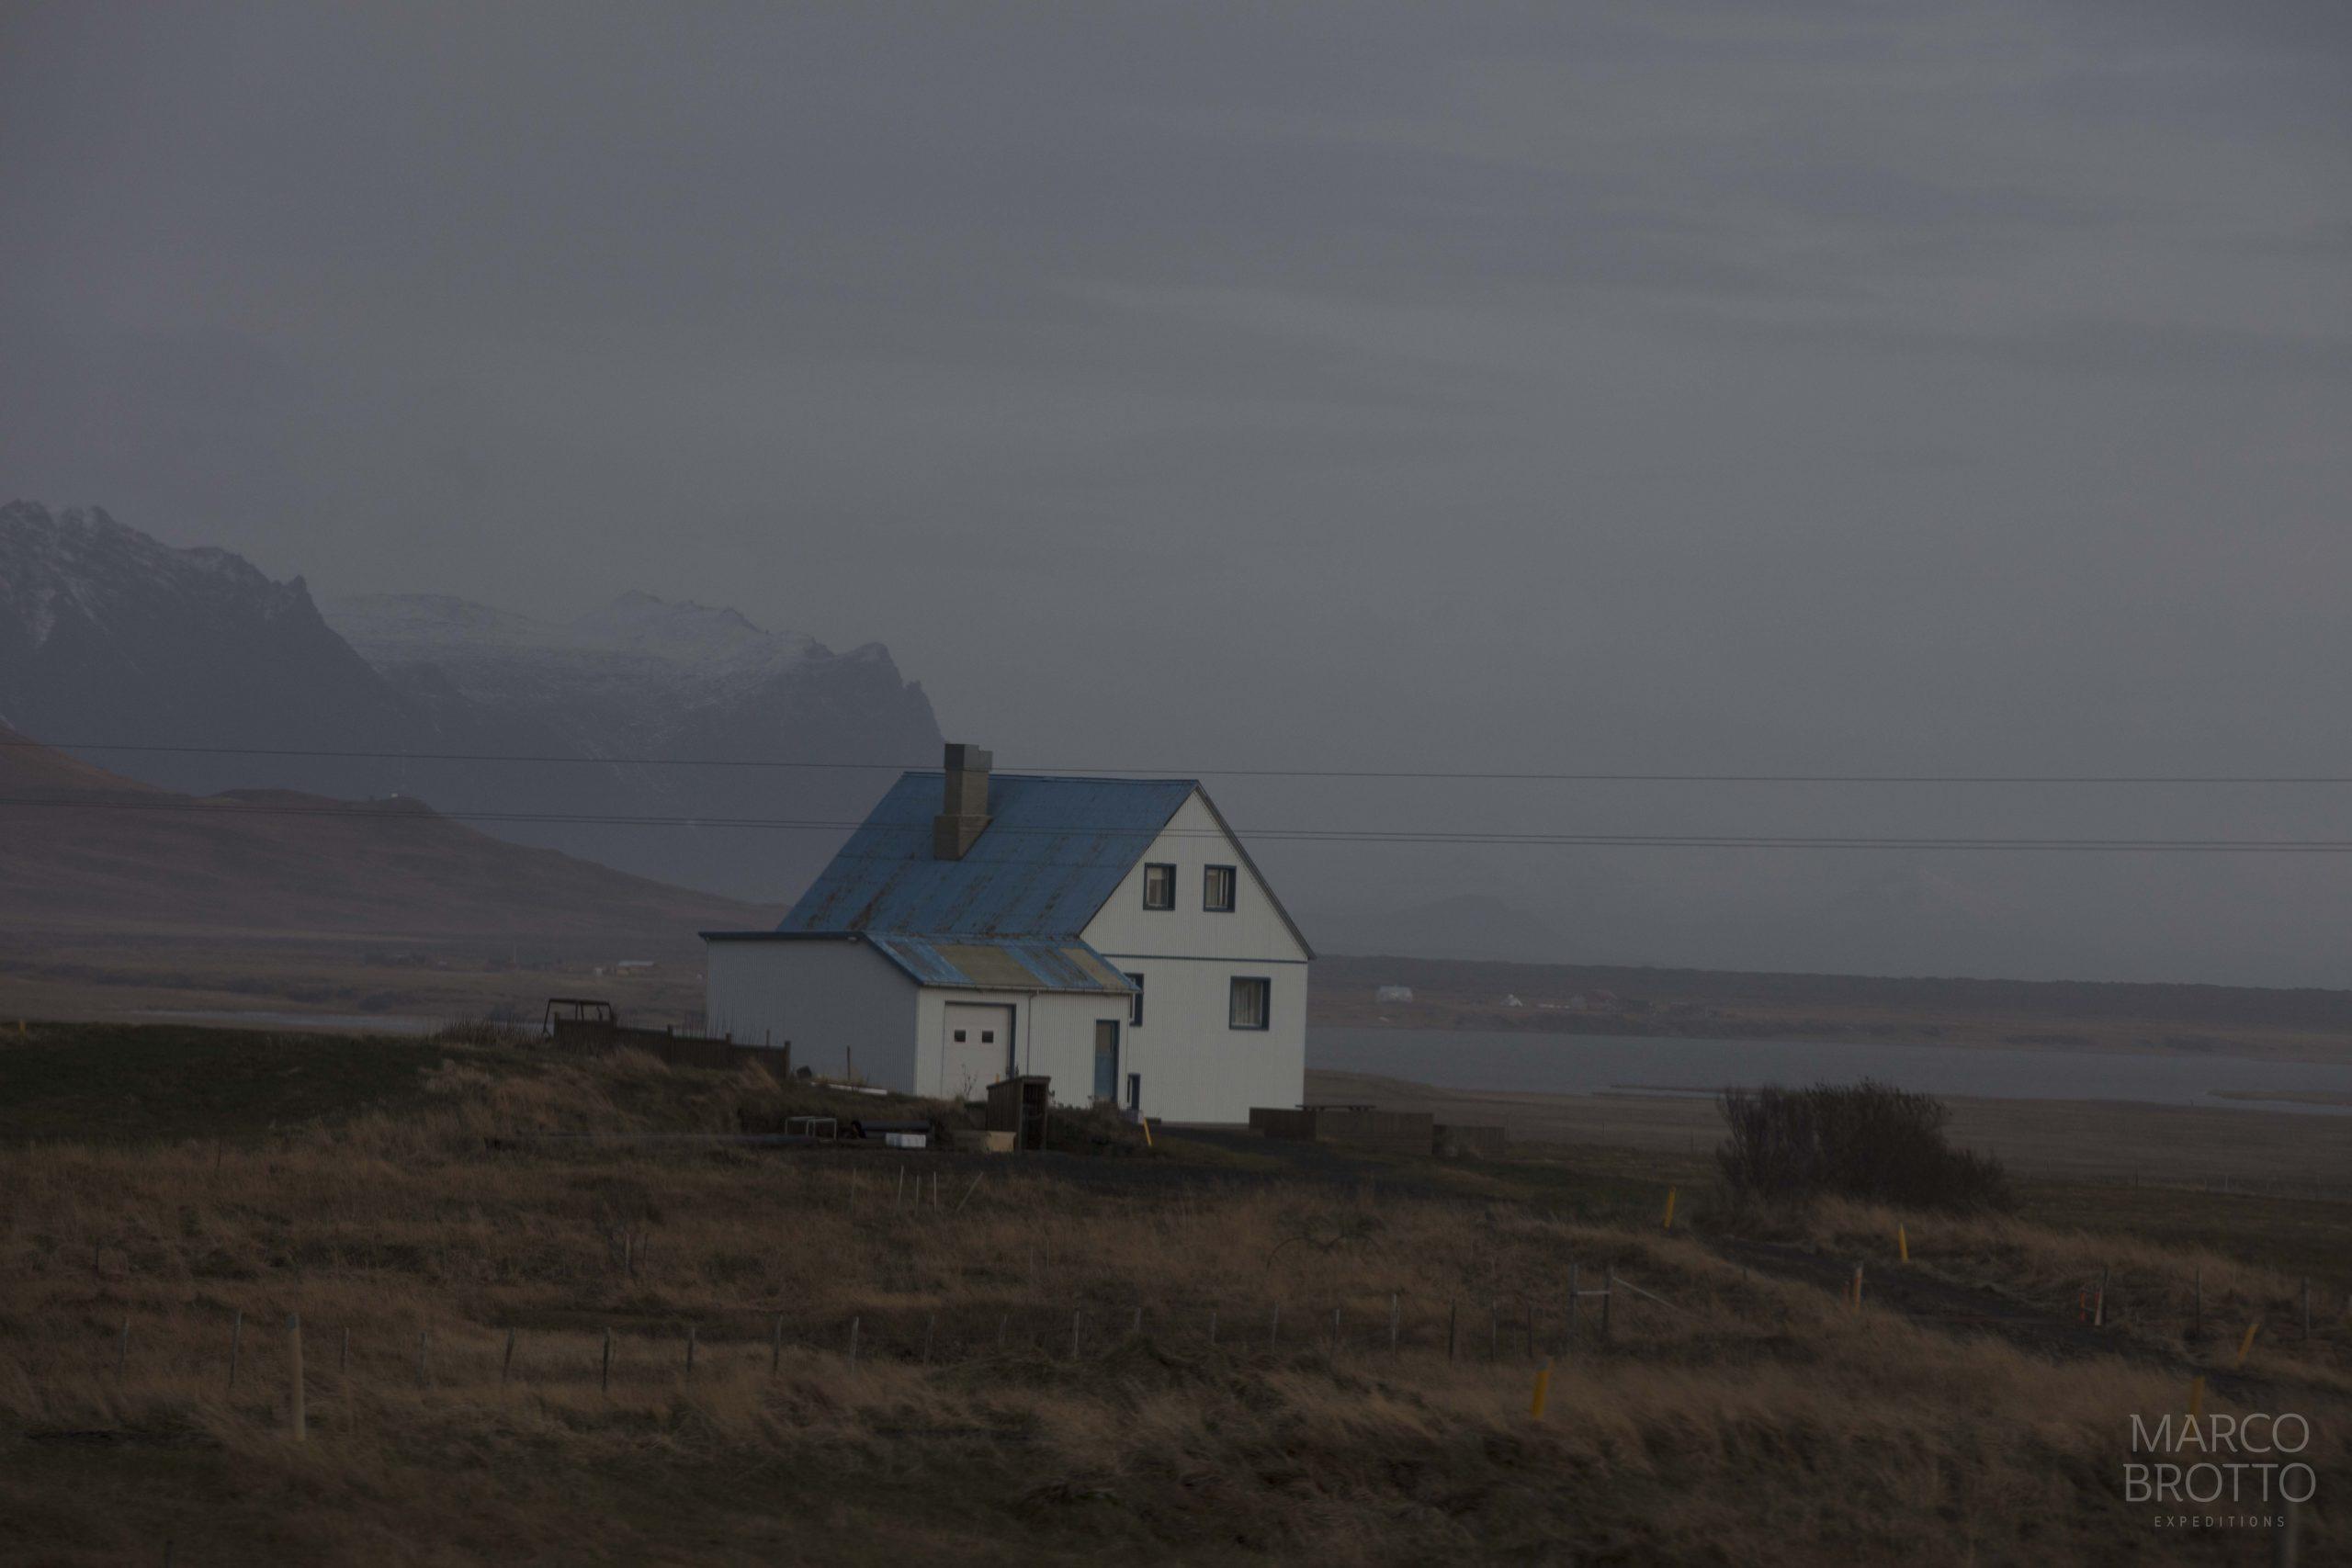 ICELAND-17-NOV-Jorge-Canon-EOS-5DS-2017-11-06-073110-16882